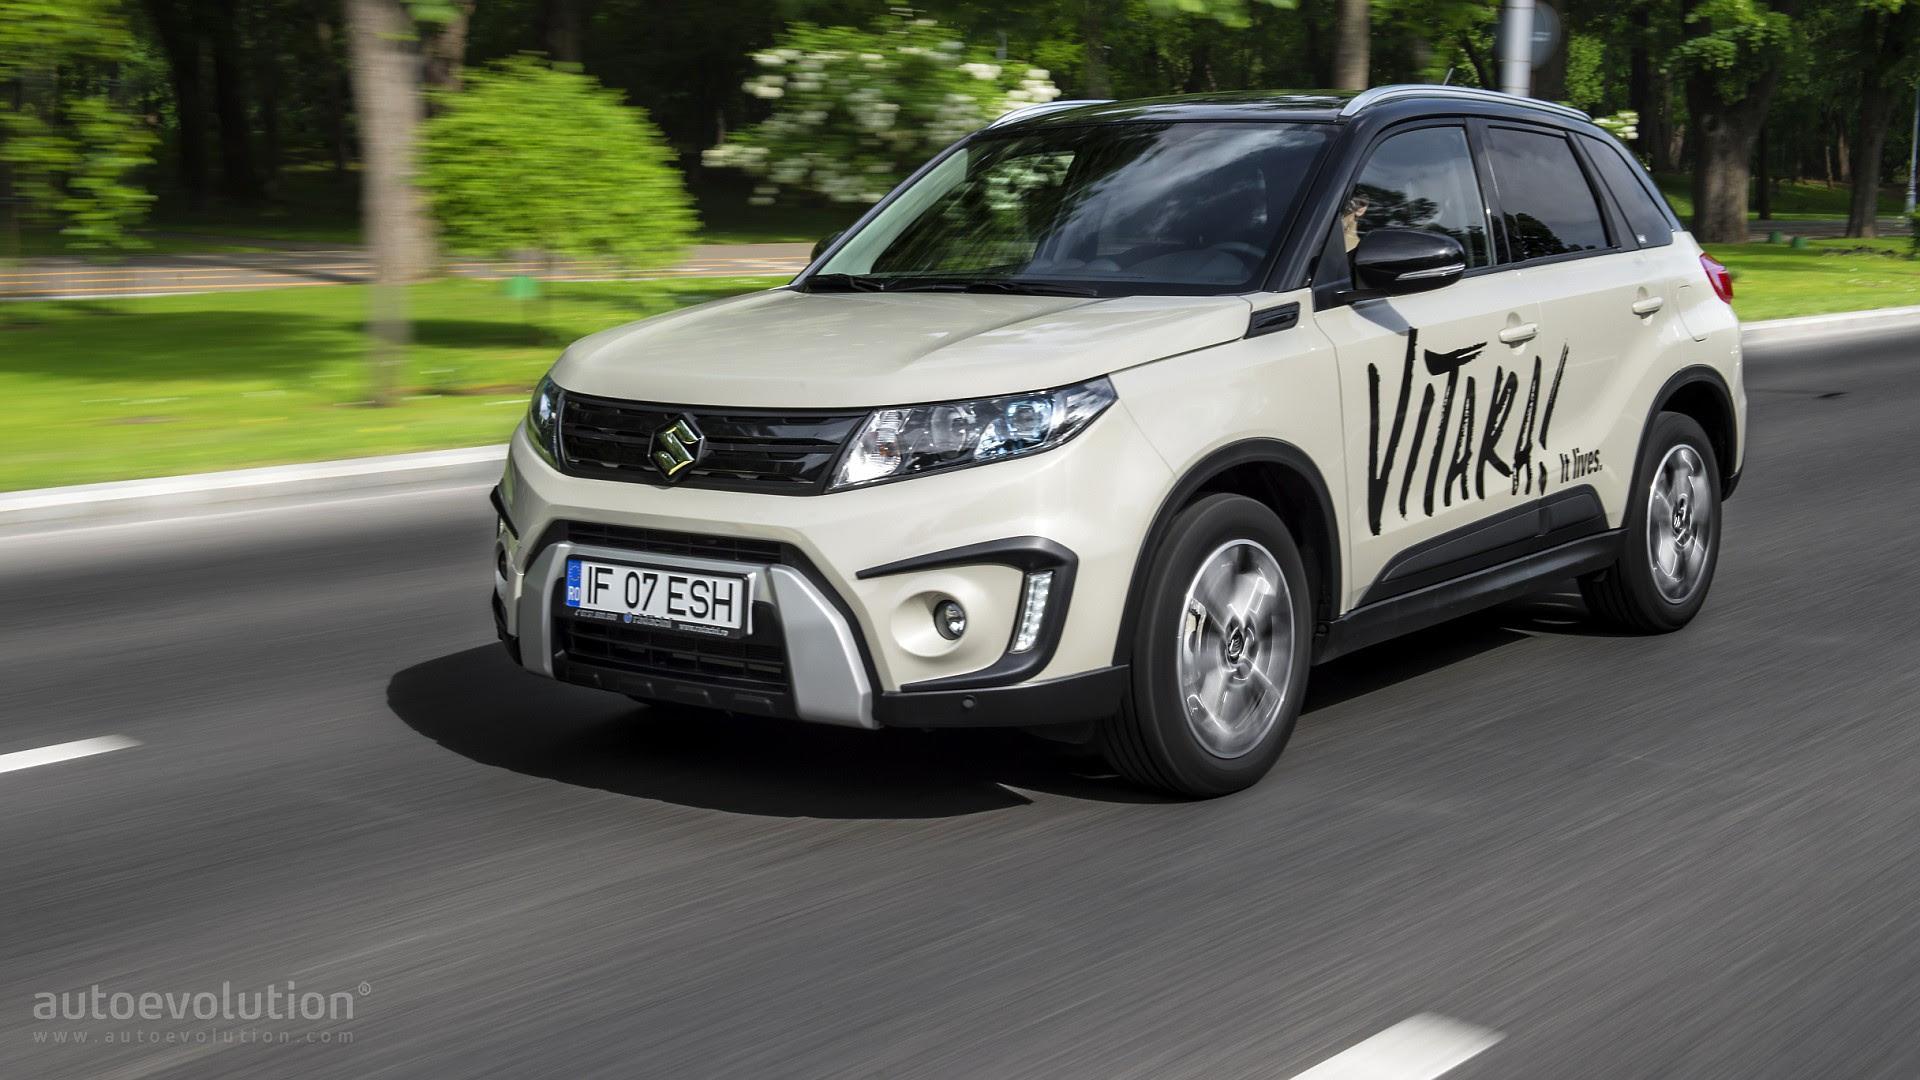 Suzuki Grand Vitara Safety Rating